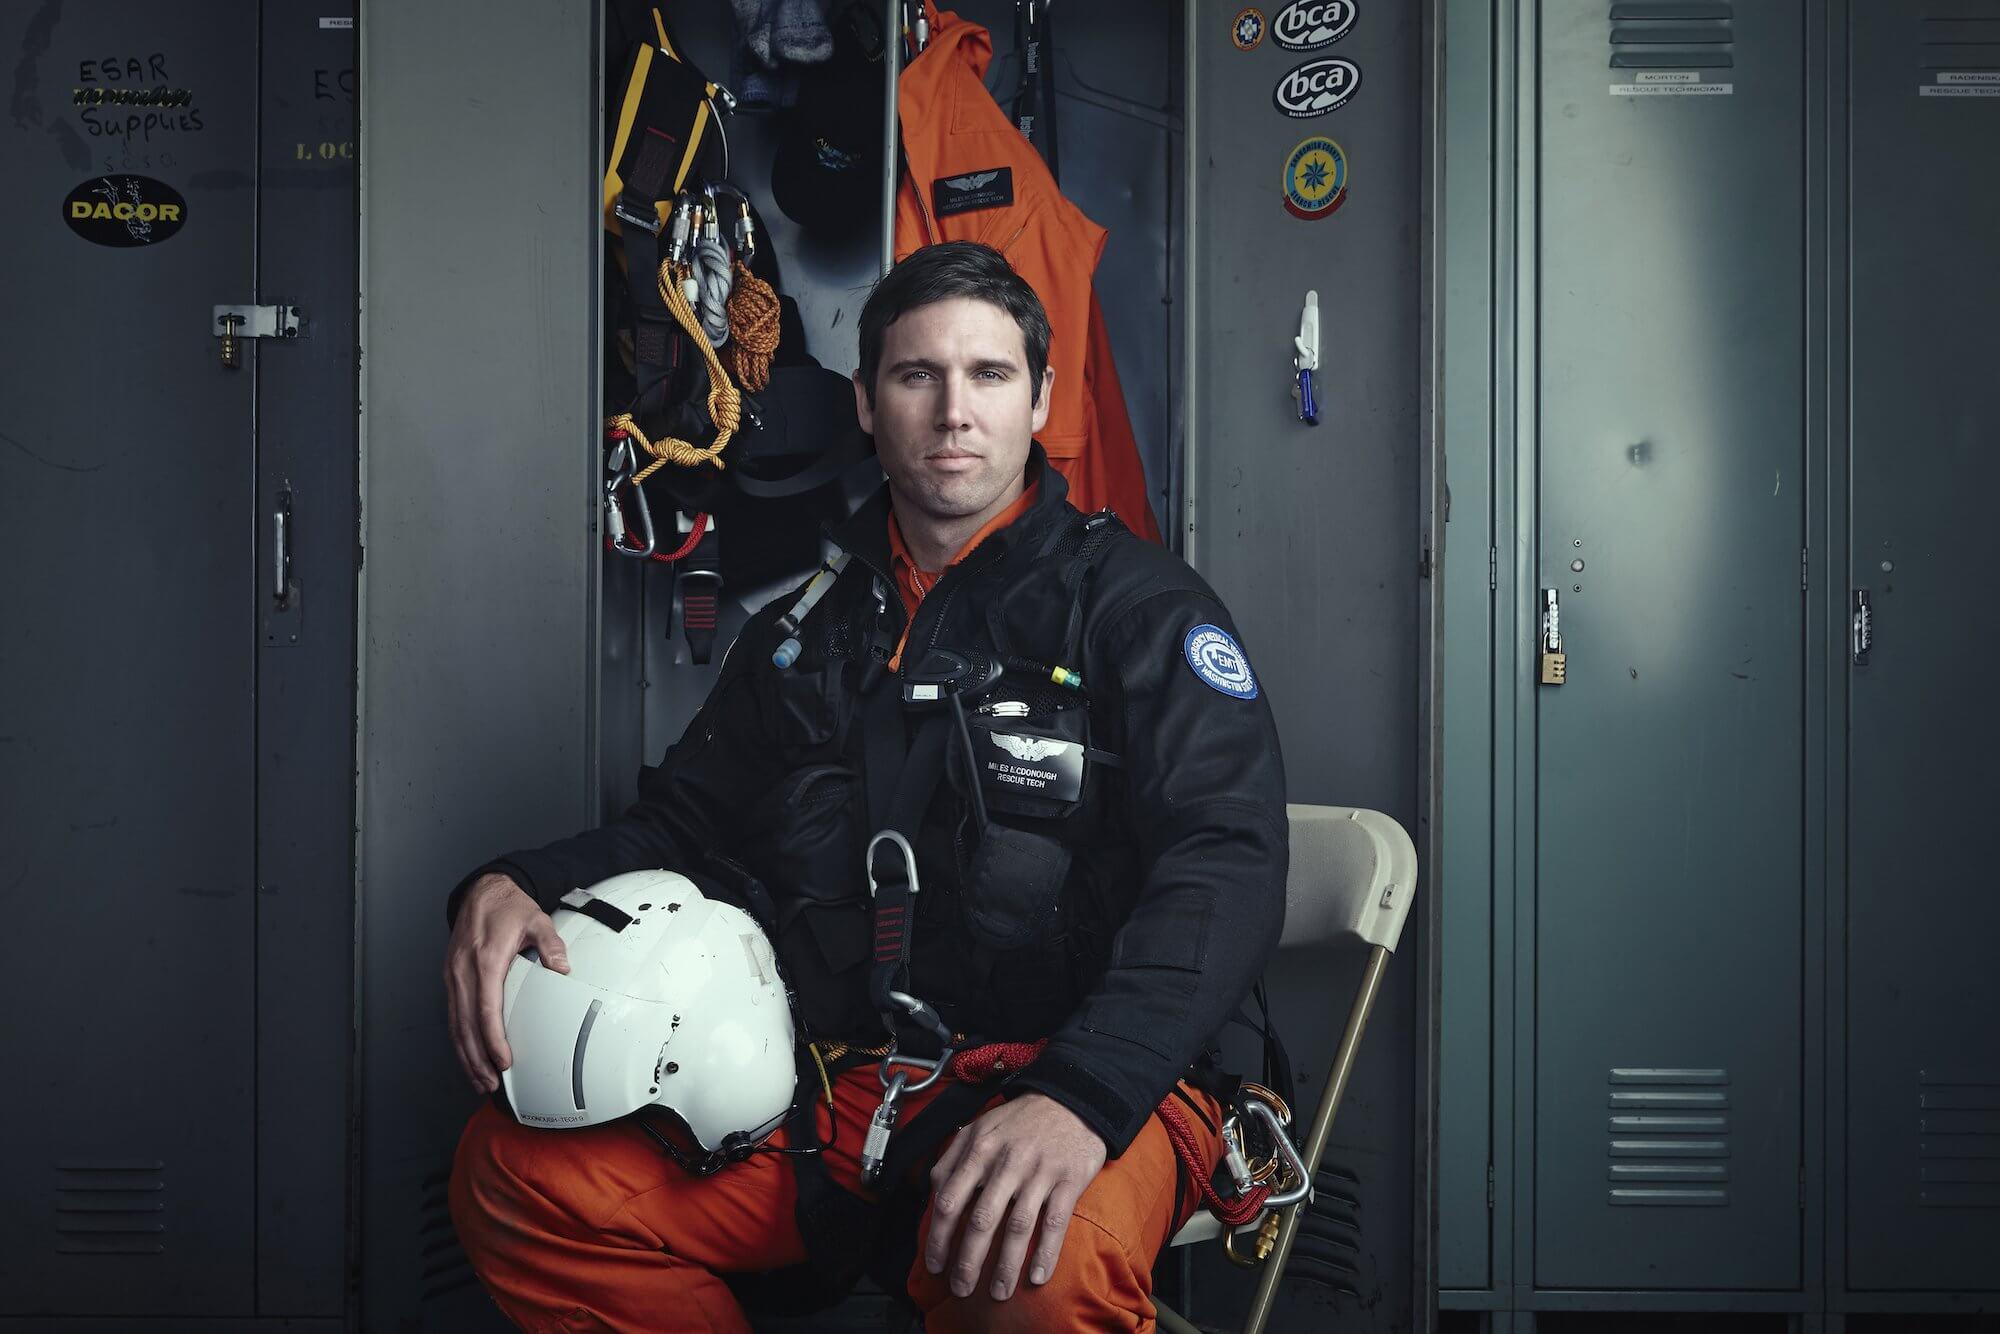 Photo of Miles McDonough in his flight gear.